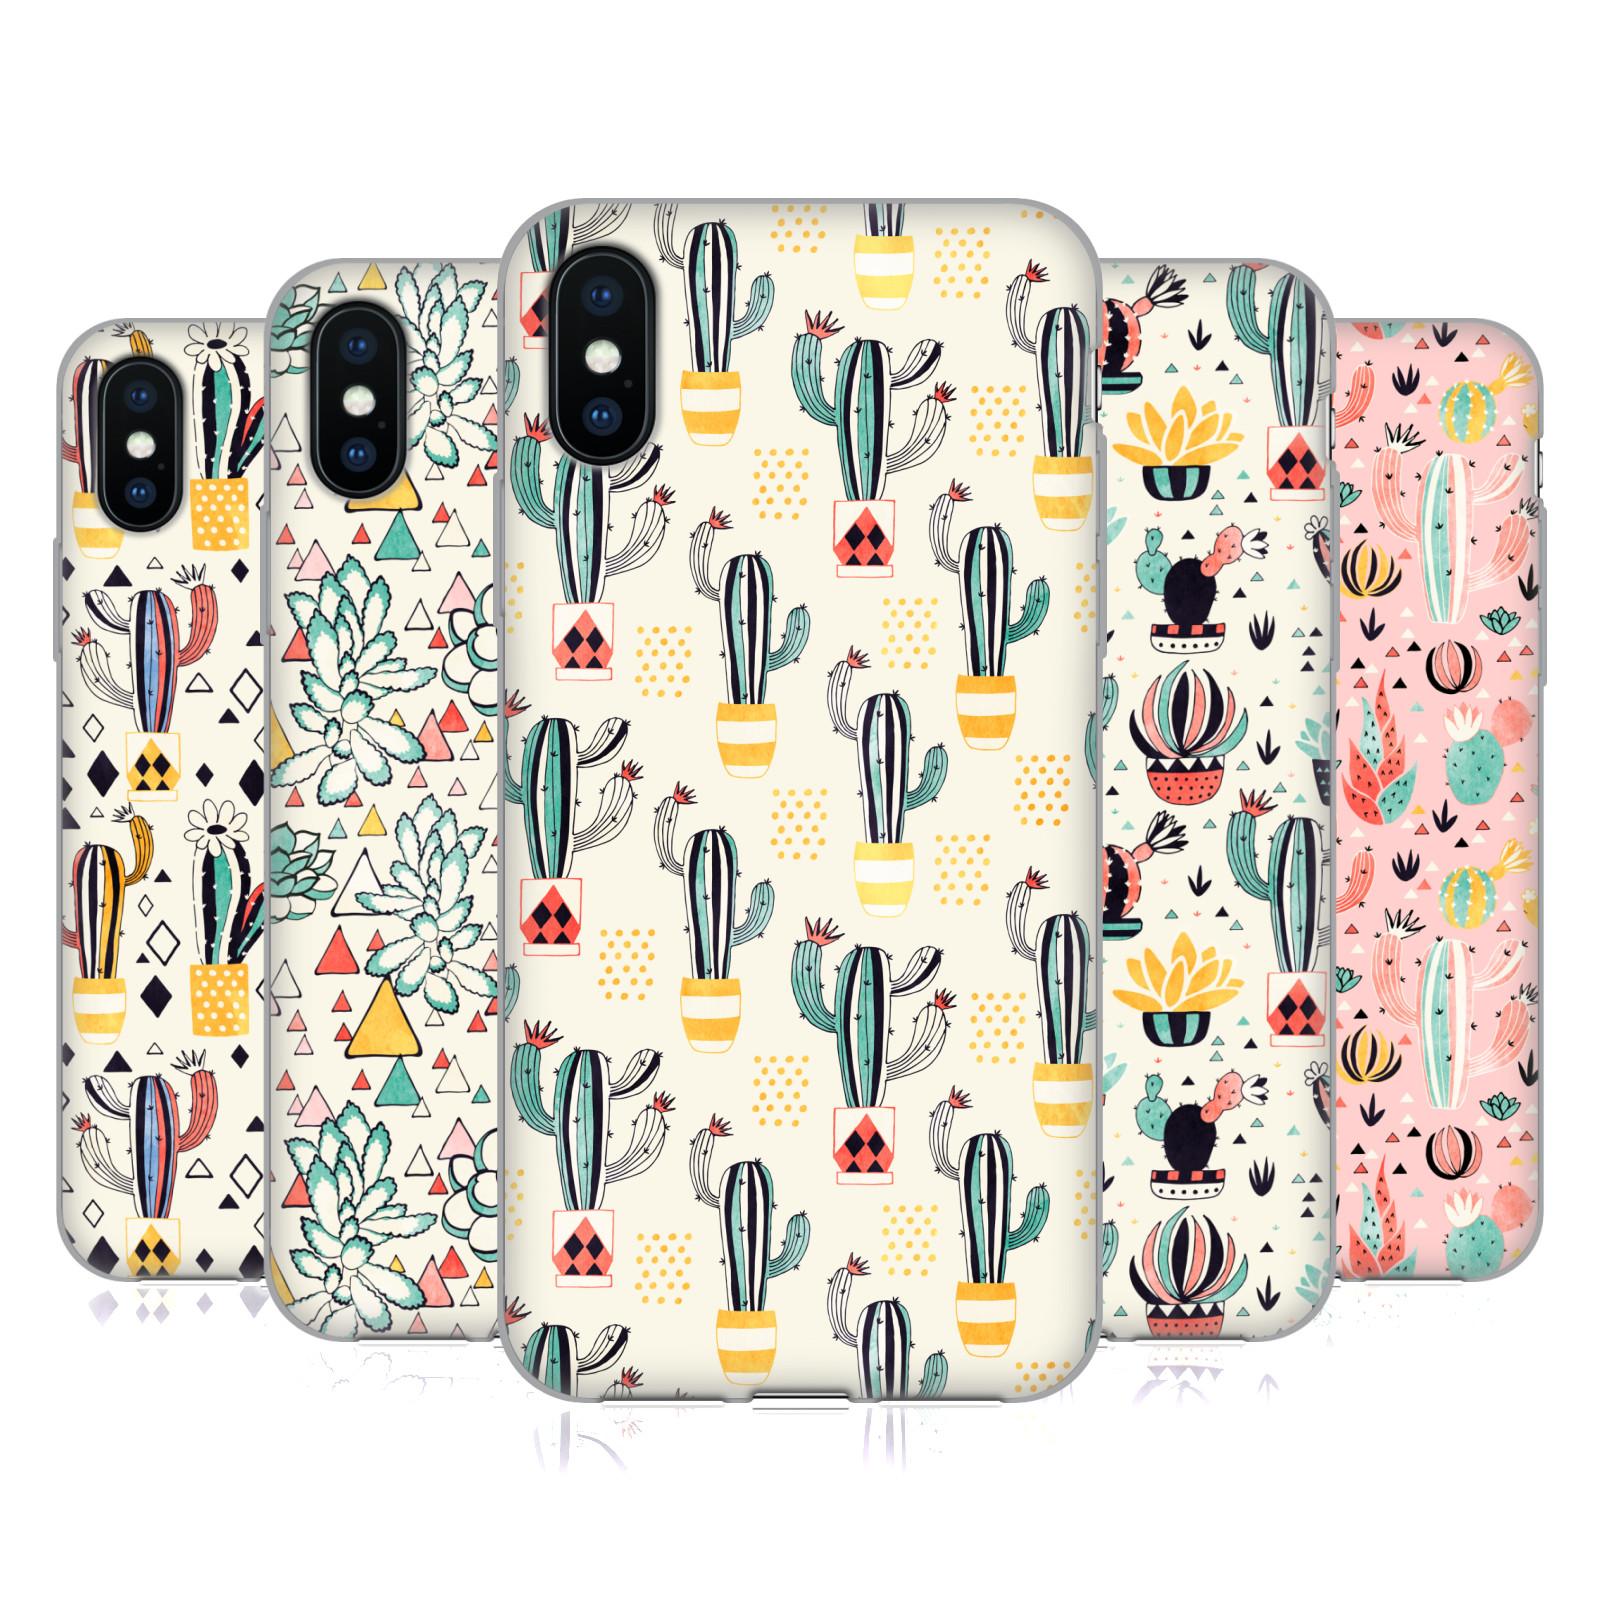 Lidiebug Assorted Designs